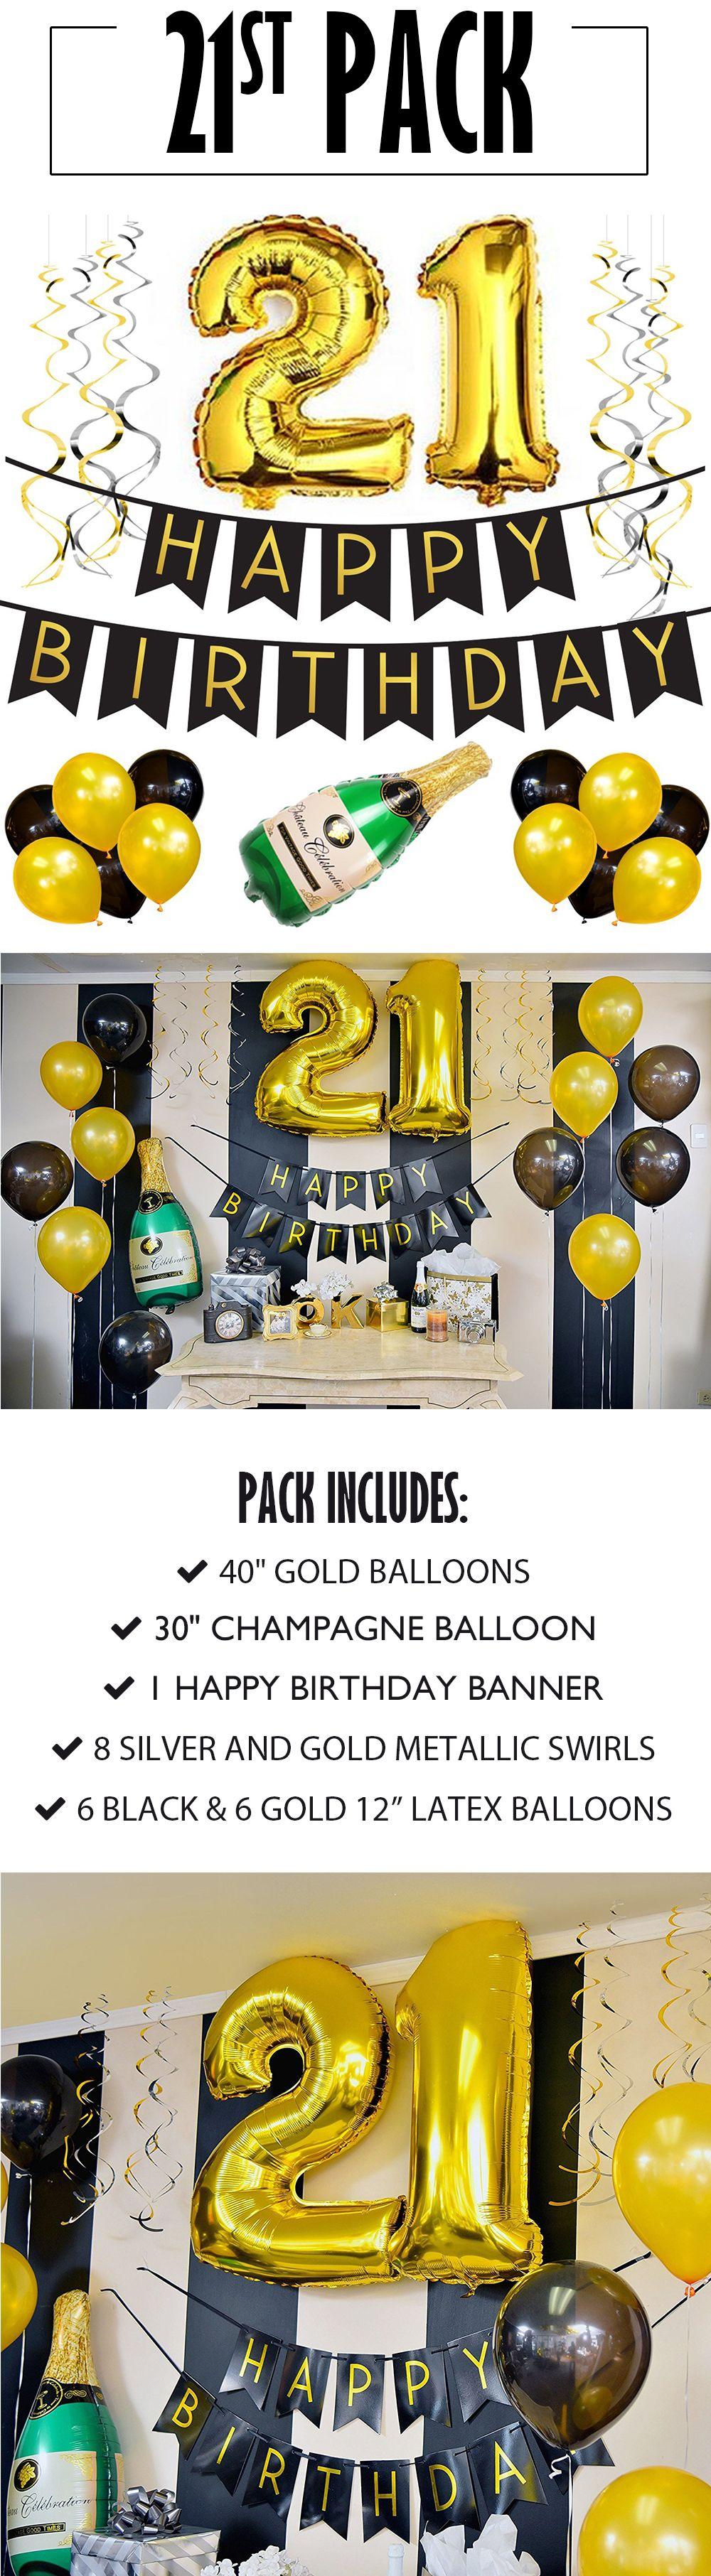 21st Birthday Banner and Balloon Pack 21st Pinterest 21st